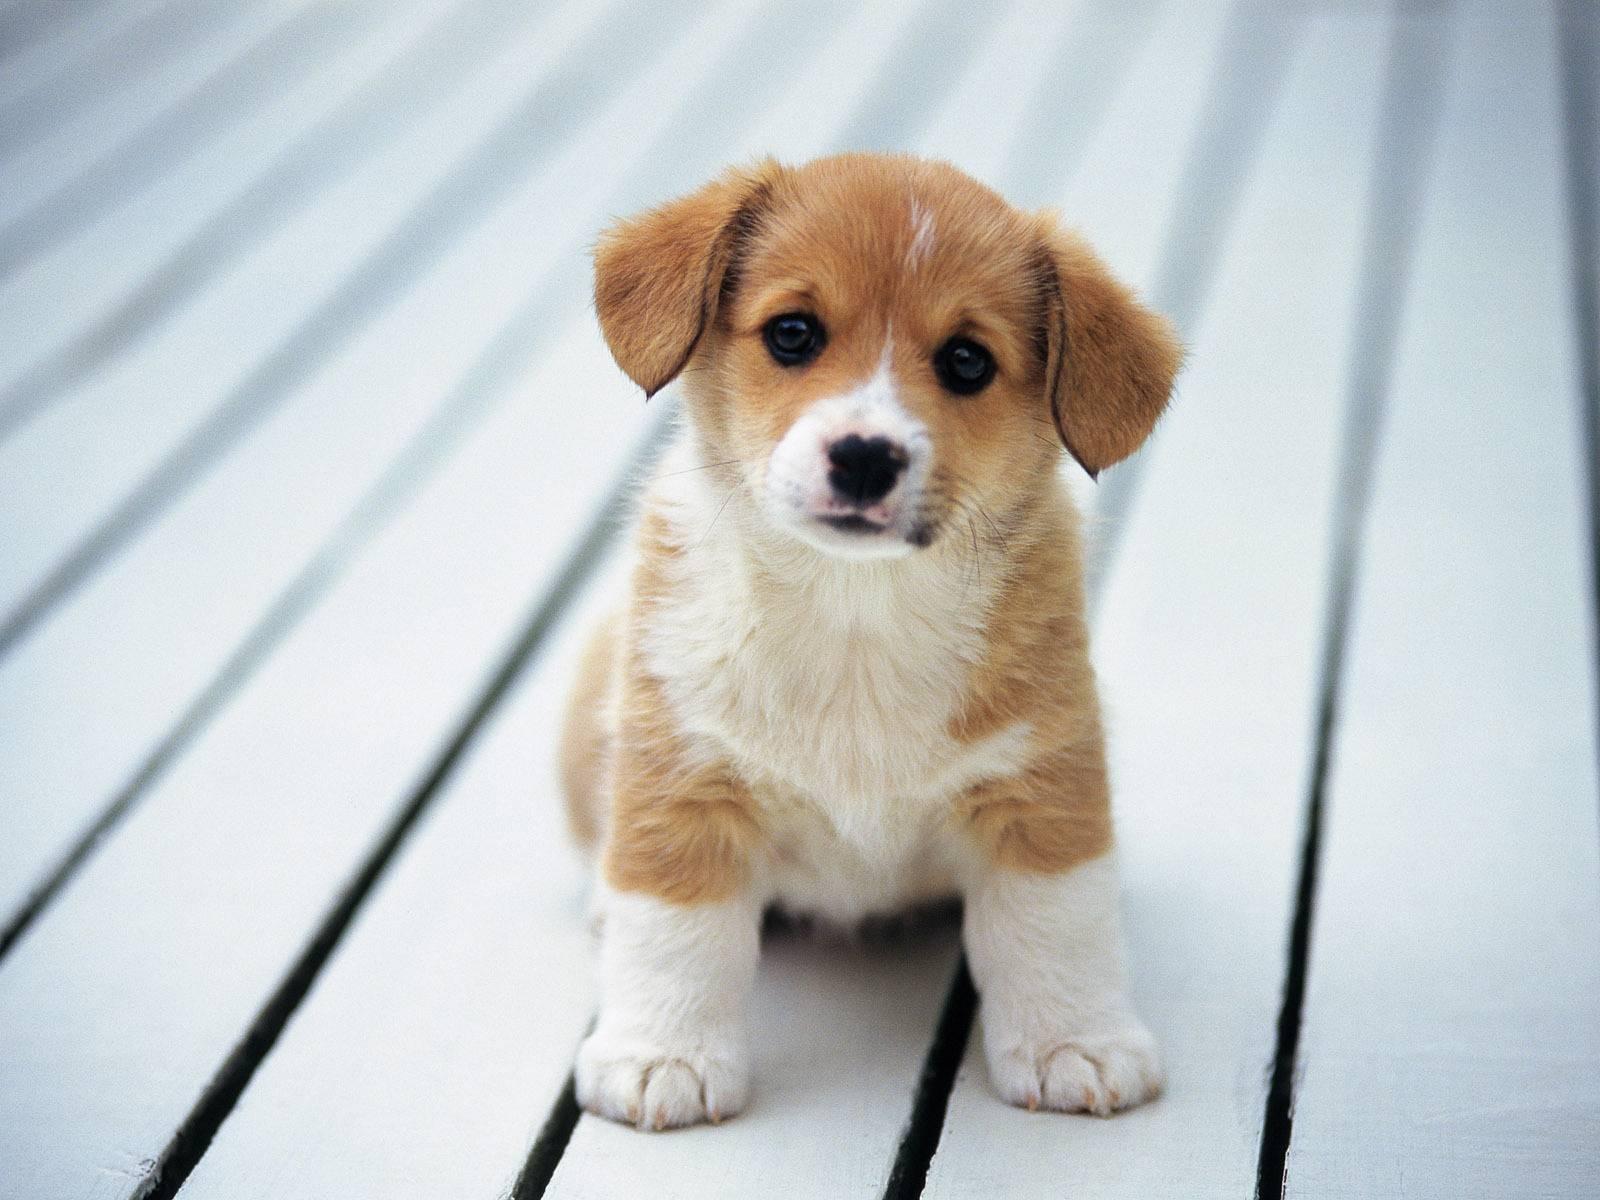 Cute Puppy   Puppies Wallpaper 1600x1200